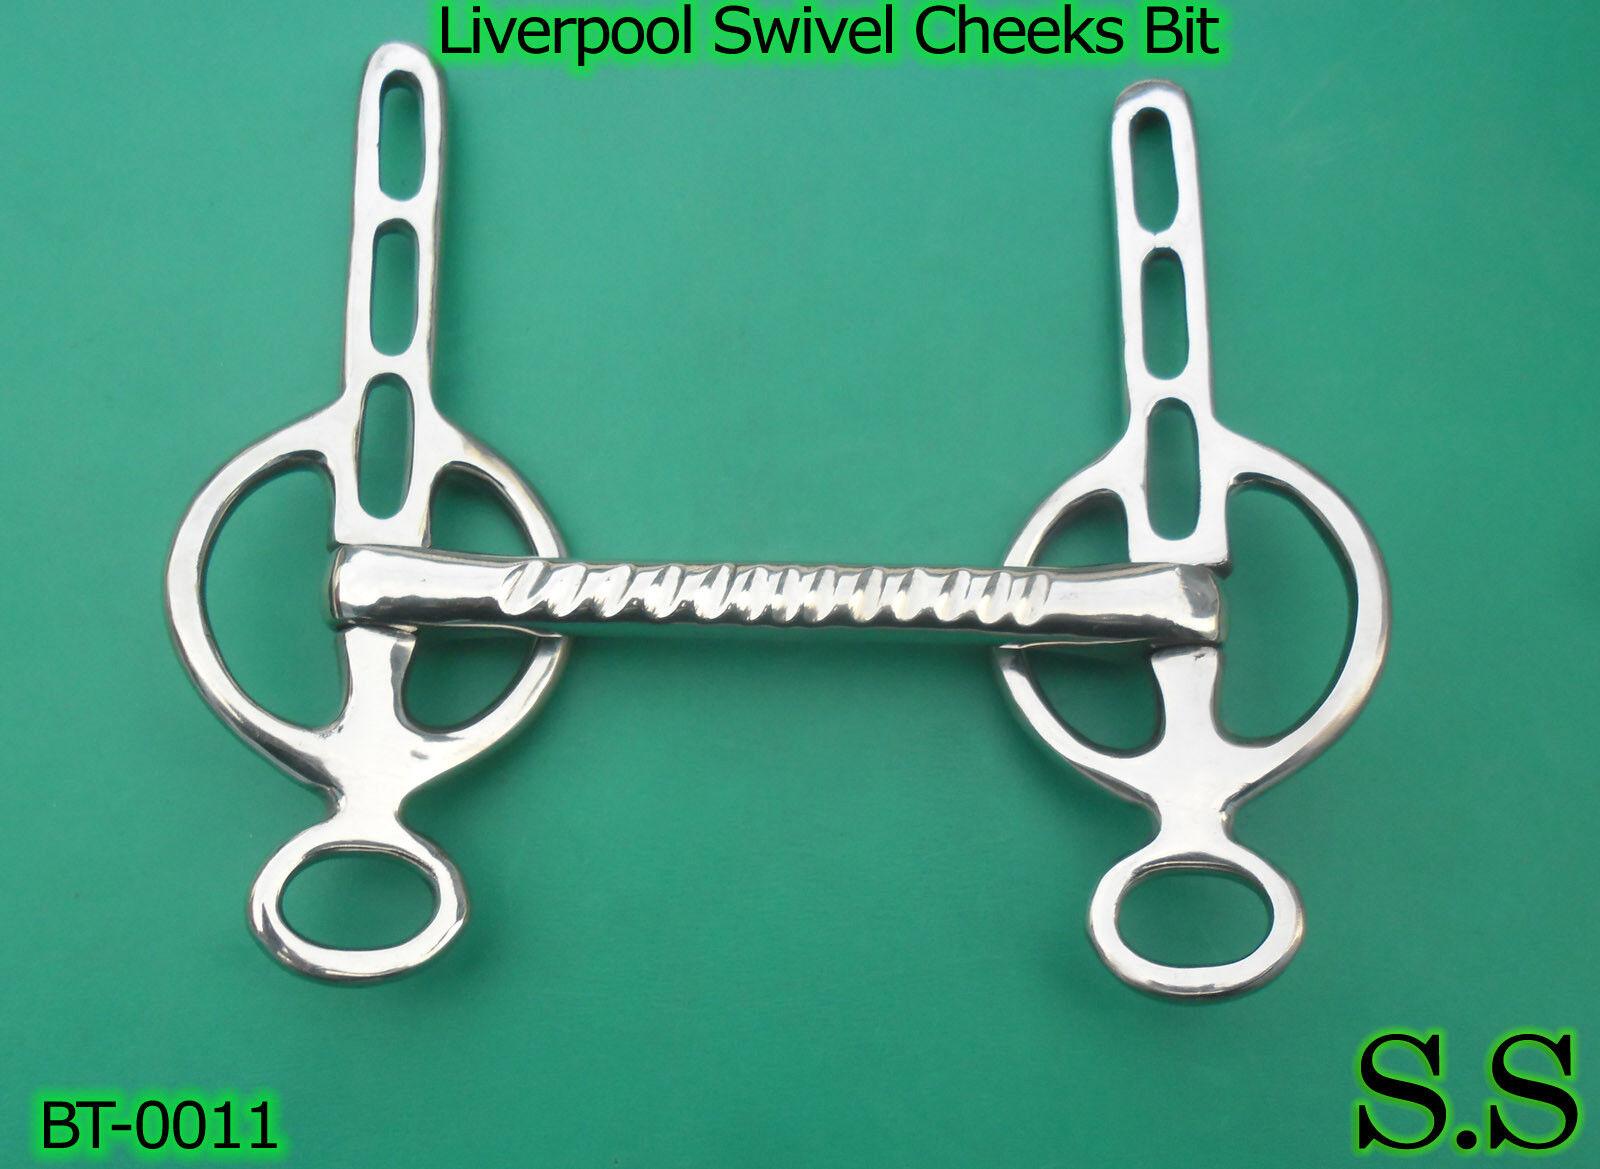 Liverpool Swivel Cheeks Bit 5 Stainless Steel BT 0011 | eBay